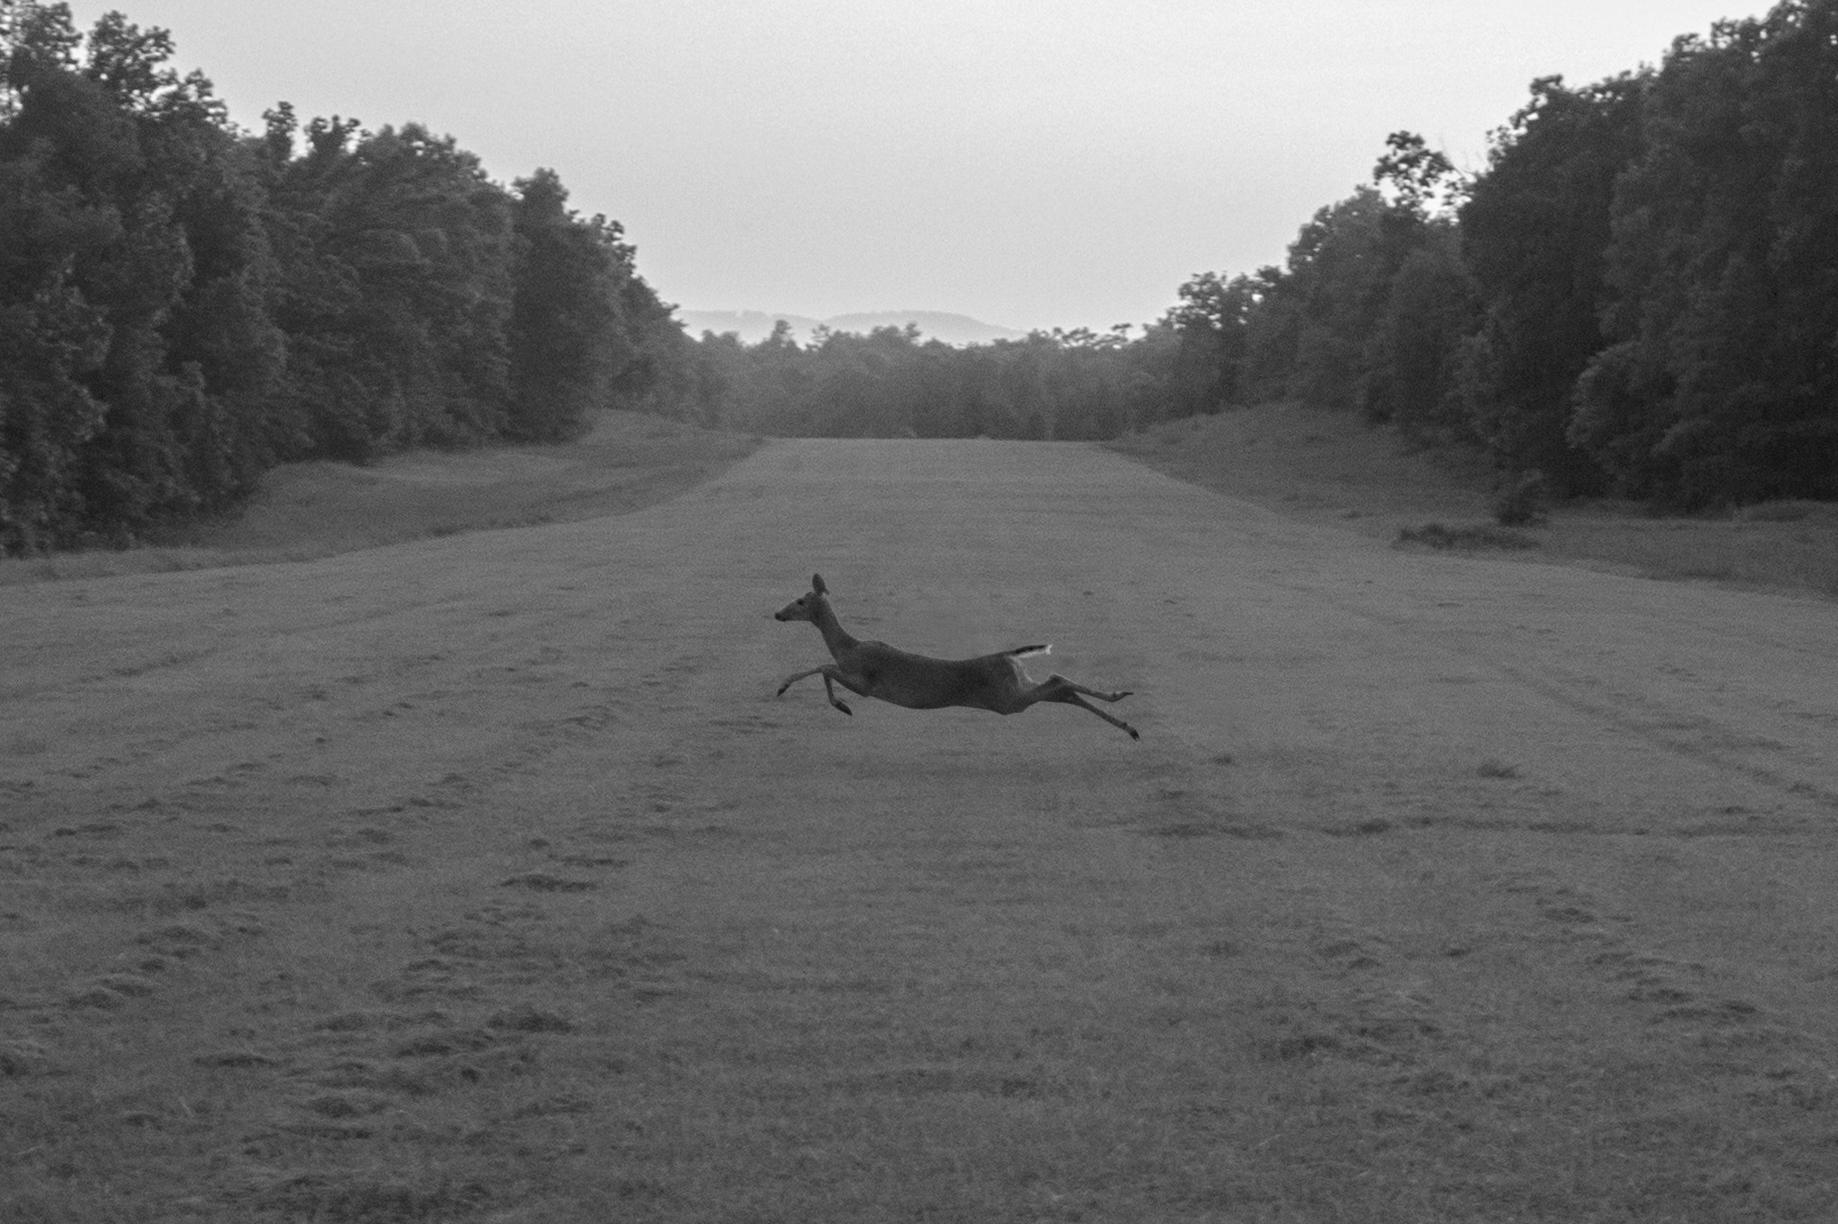 Caught this fella darting across the grass airport runway in Bull Shoals, AR.